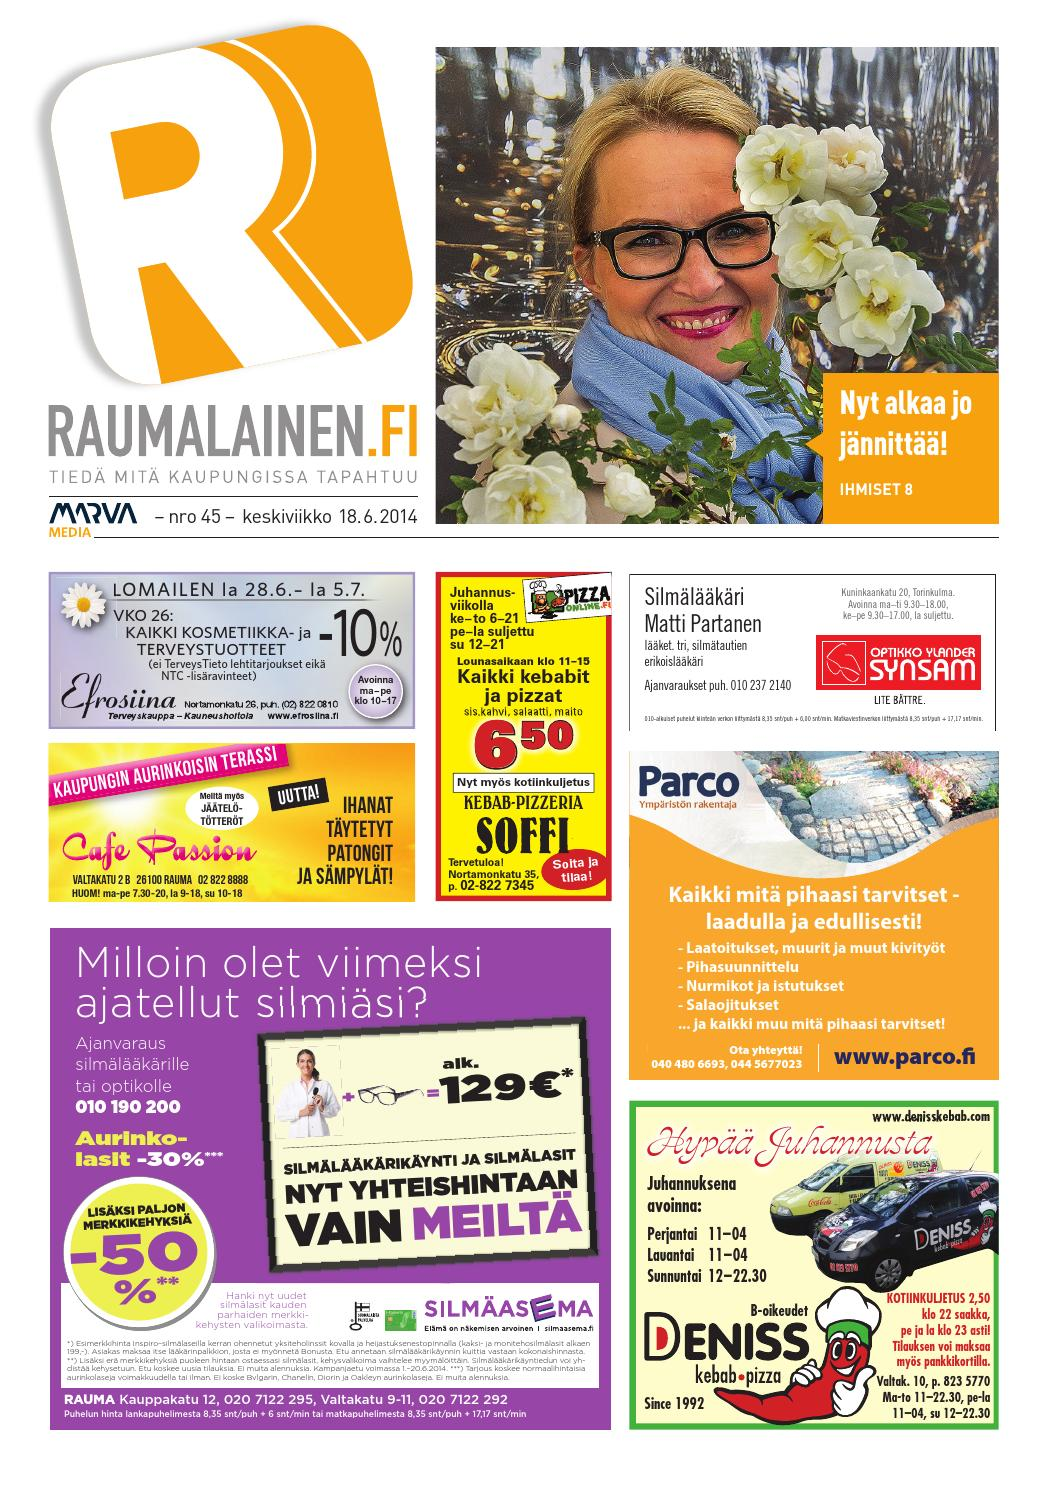 Raumalainen 18.6.2014 by Marva Group - issuu 4746bd633c